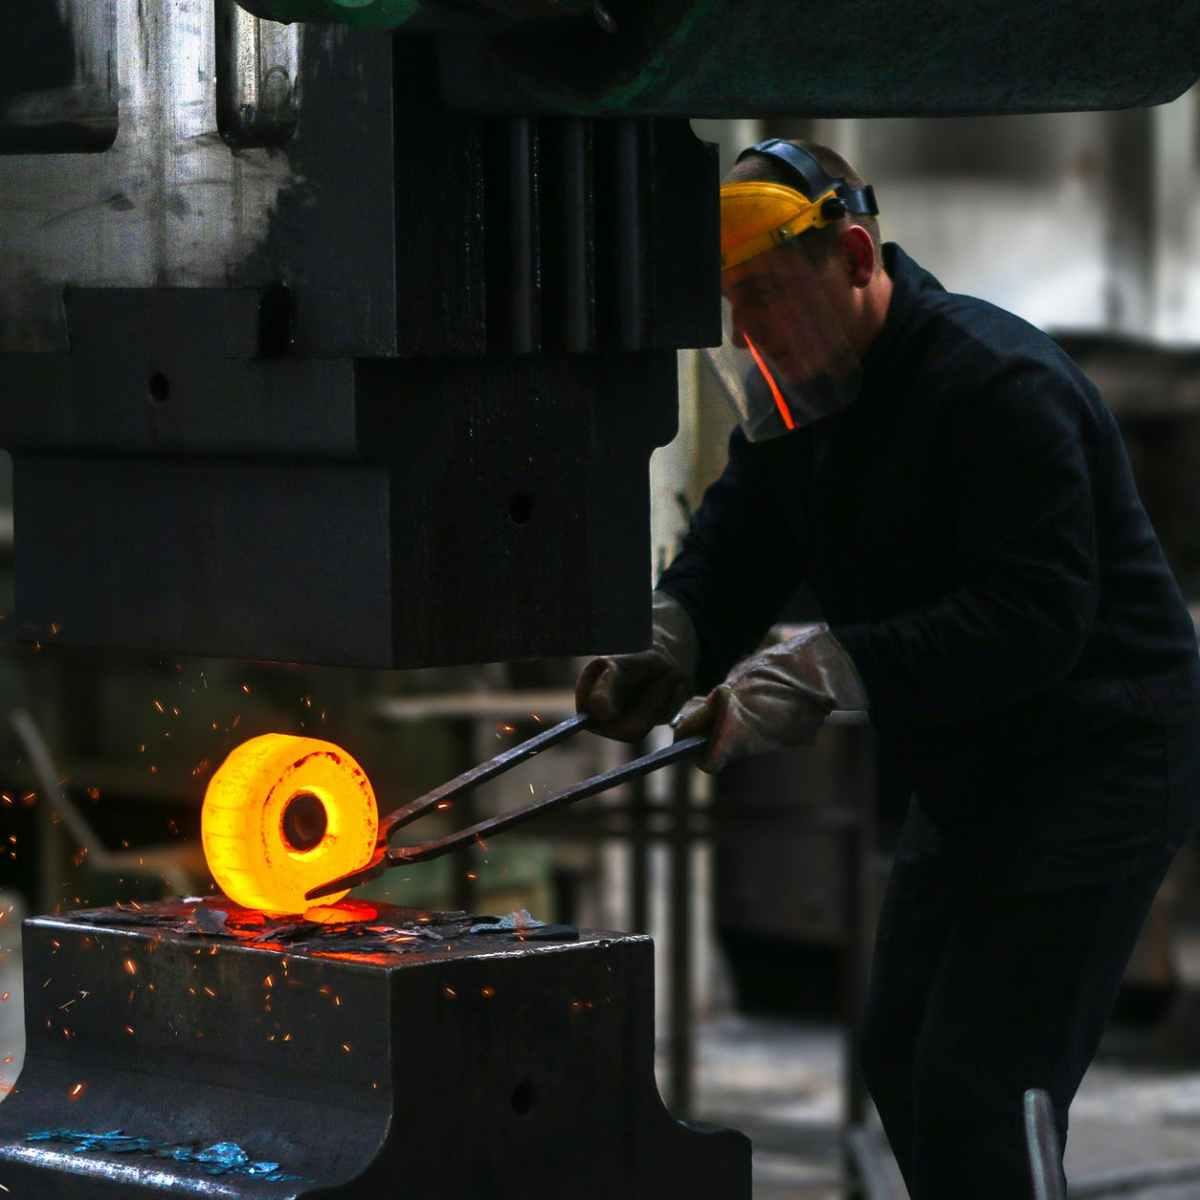 man lifting hot metal